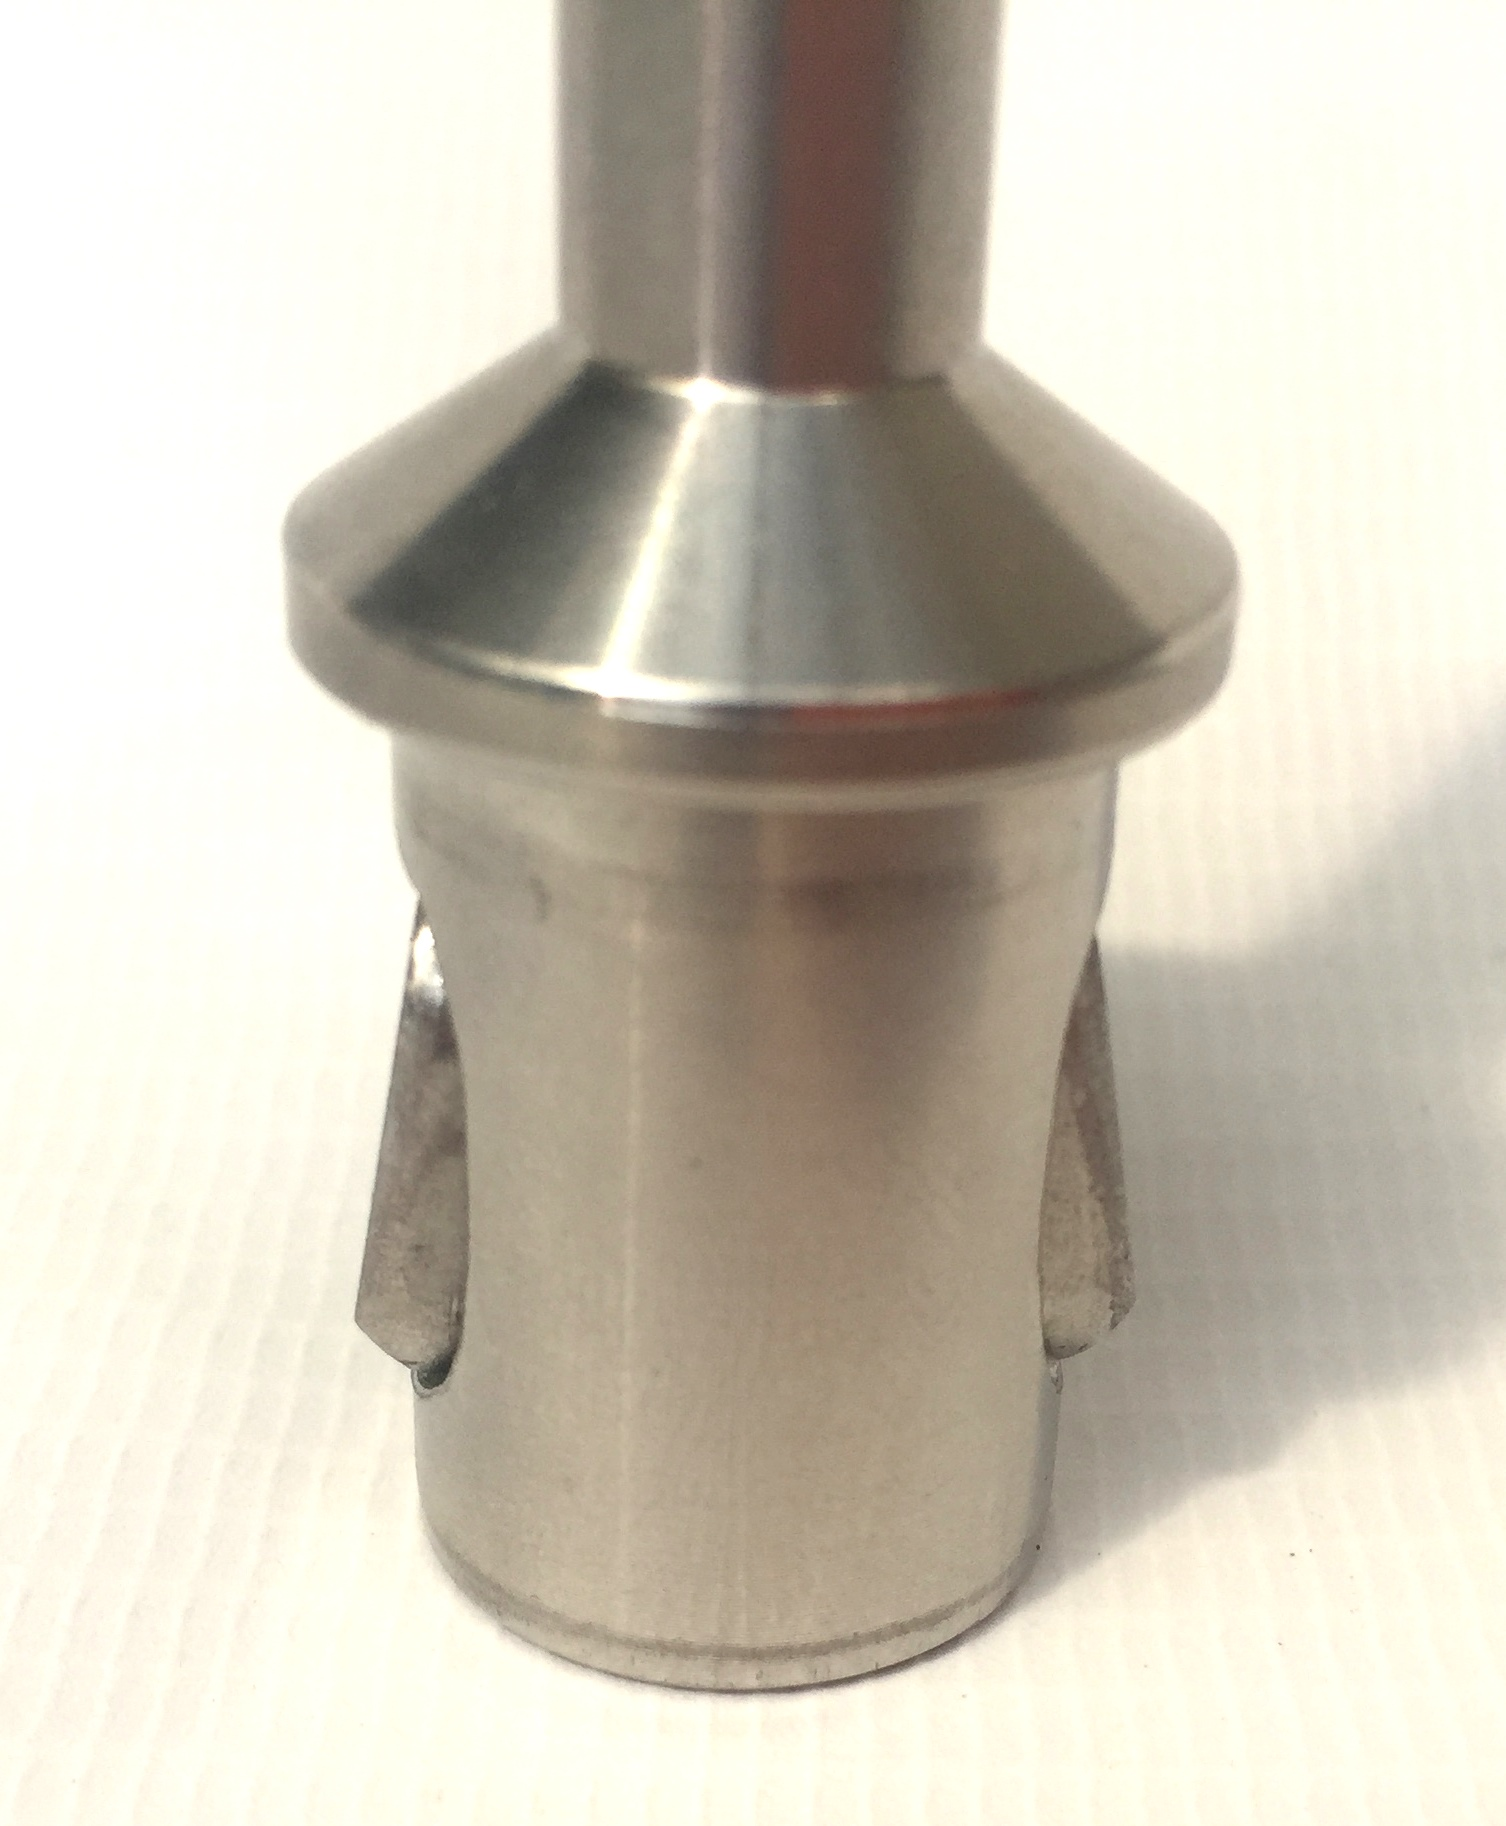 SnapLok 8mm Quick Release Drill Adaptor - DQ600